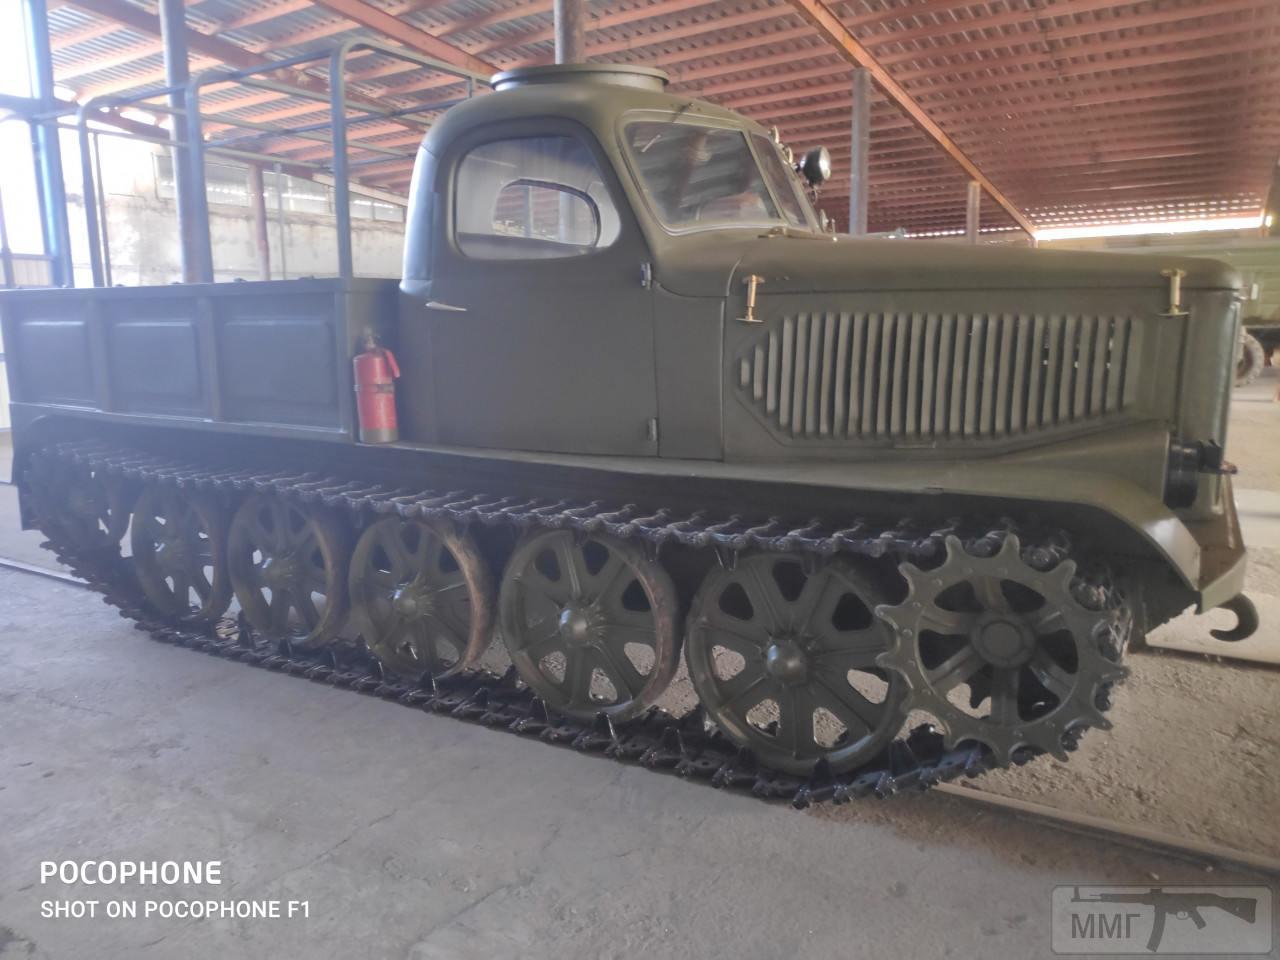 110206 - Музей техники Фаэтон в г. Запорожье